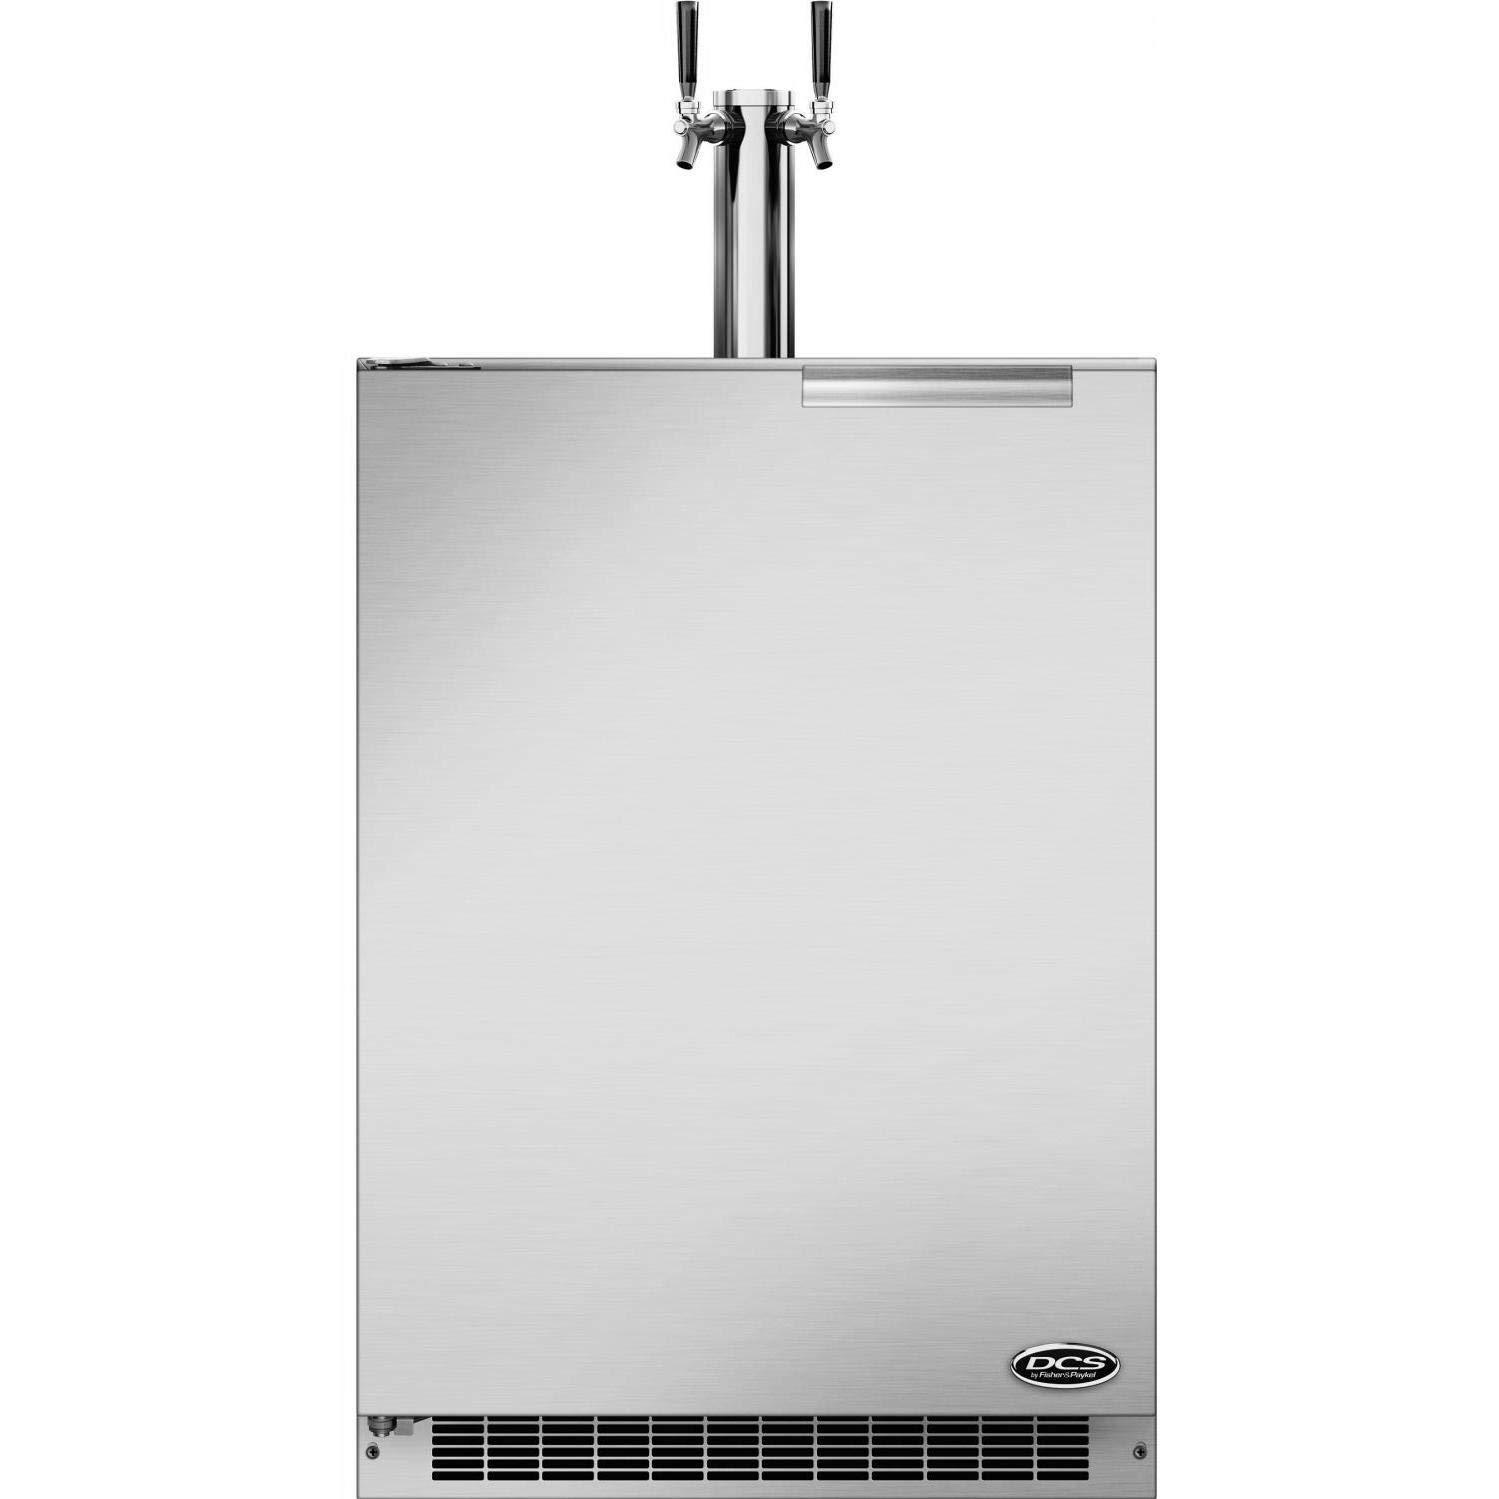 DCS 24-Inch 5.7 Cu. Ft. Left Hinge Outdoor Rated Dual Tap Beer Dispenser/Kegerator - RF24BTL1